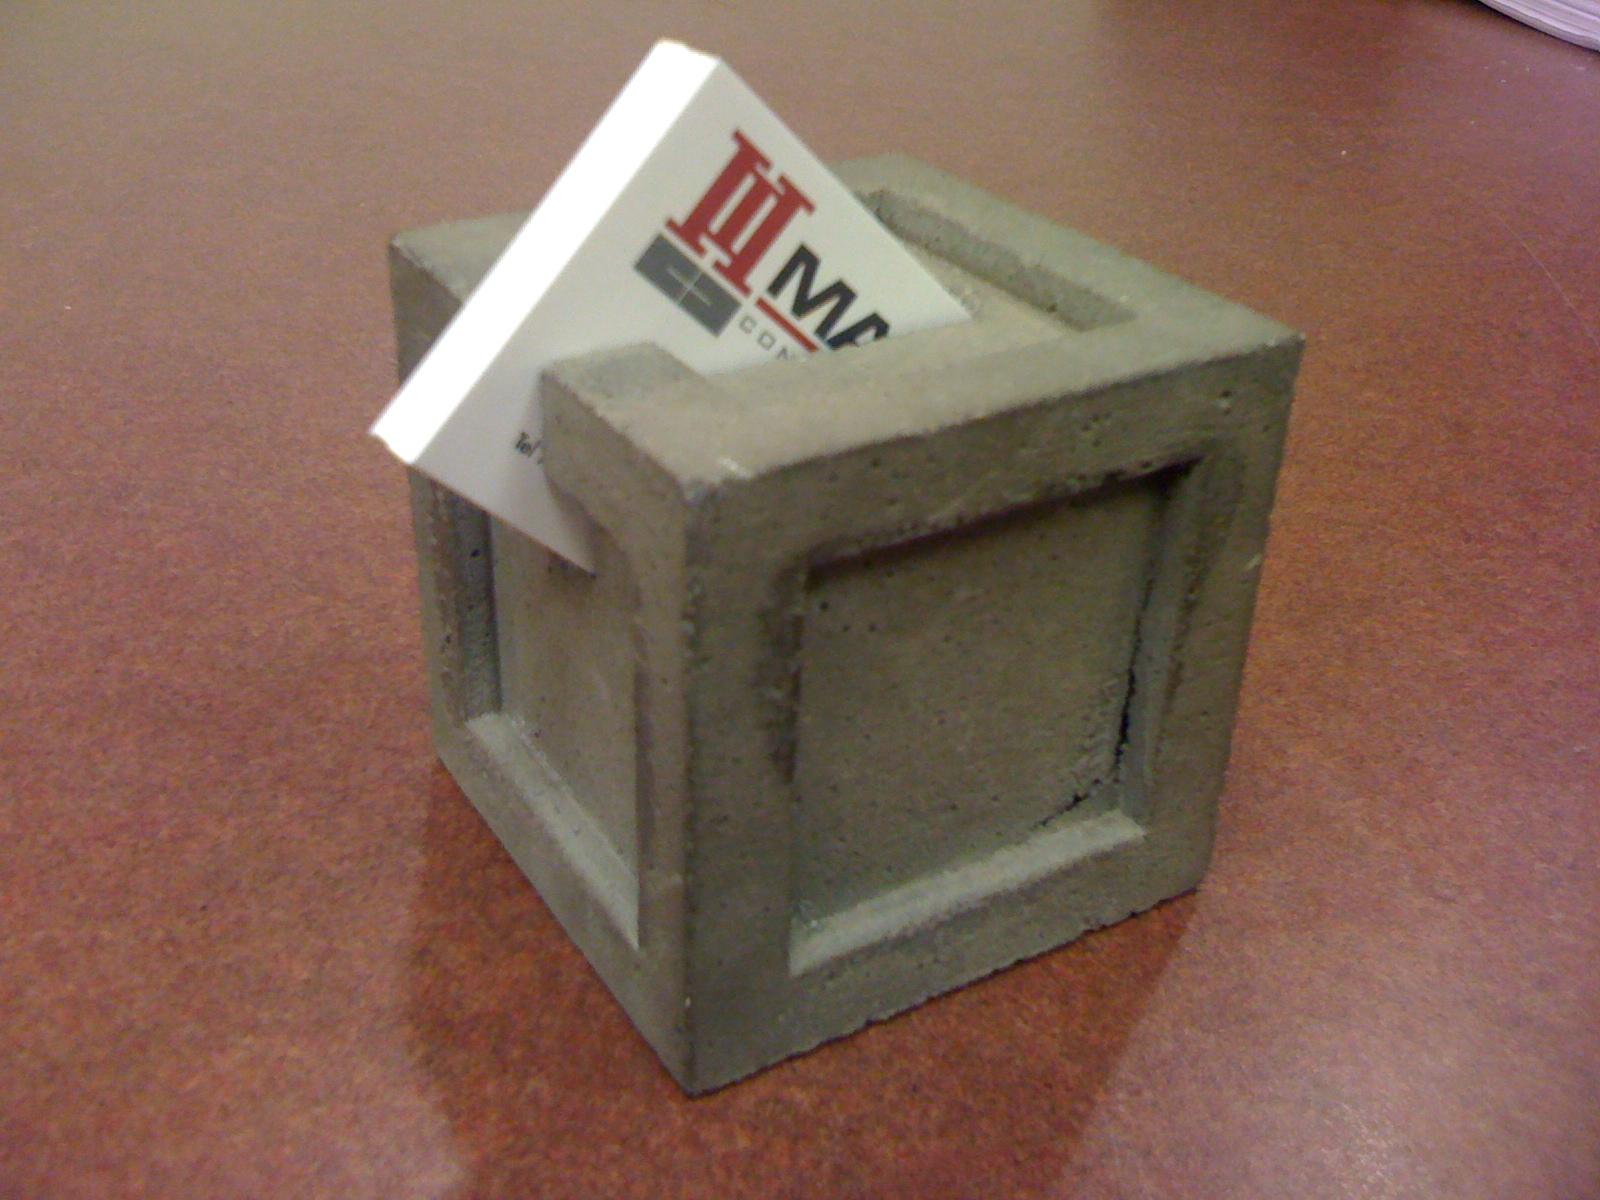 My Creativity Engine: Concrete Business Card Holder